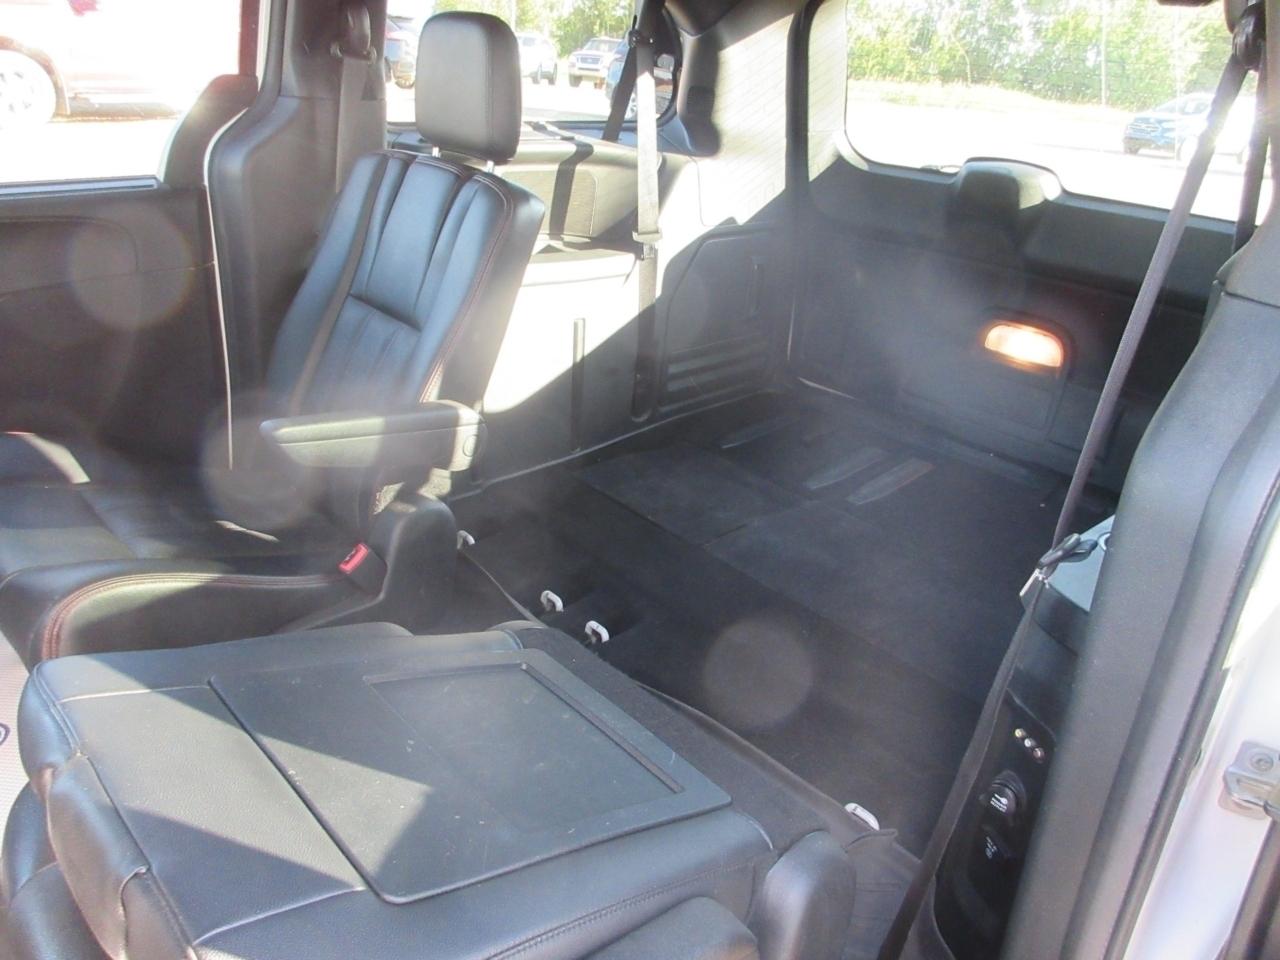 2013 Dodge Grand Caravan Wagon R/T